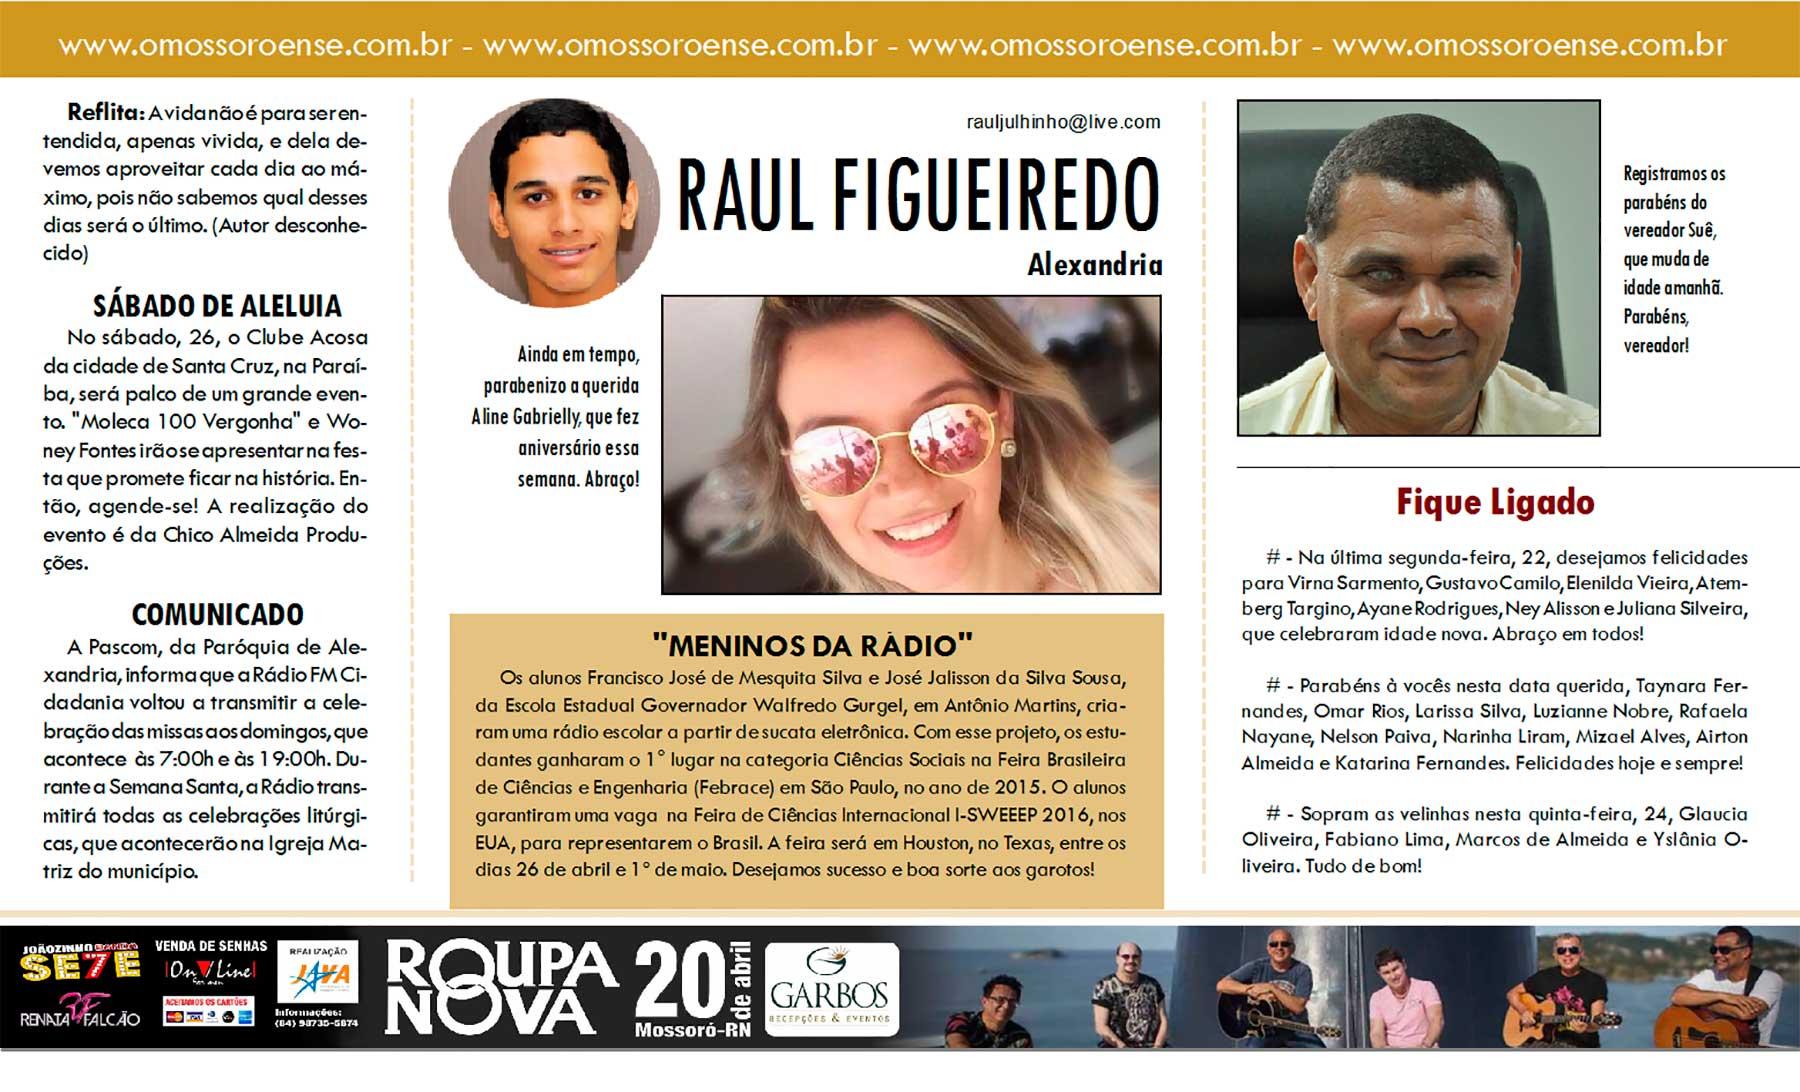 RAUL-FIGUEIREDO---22-03-2016